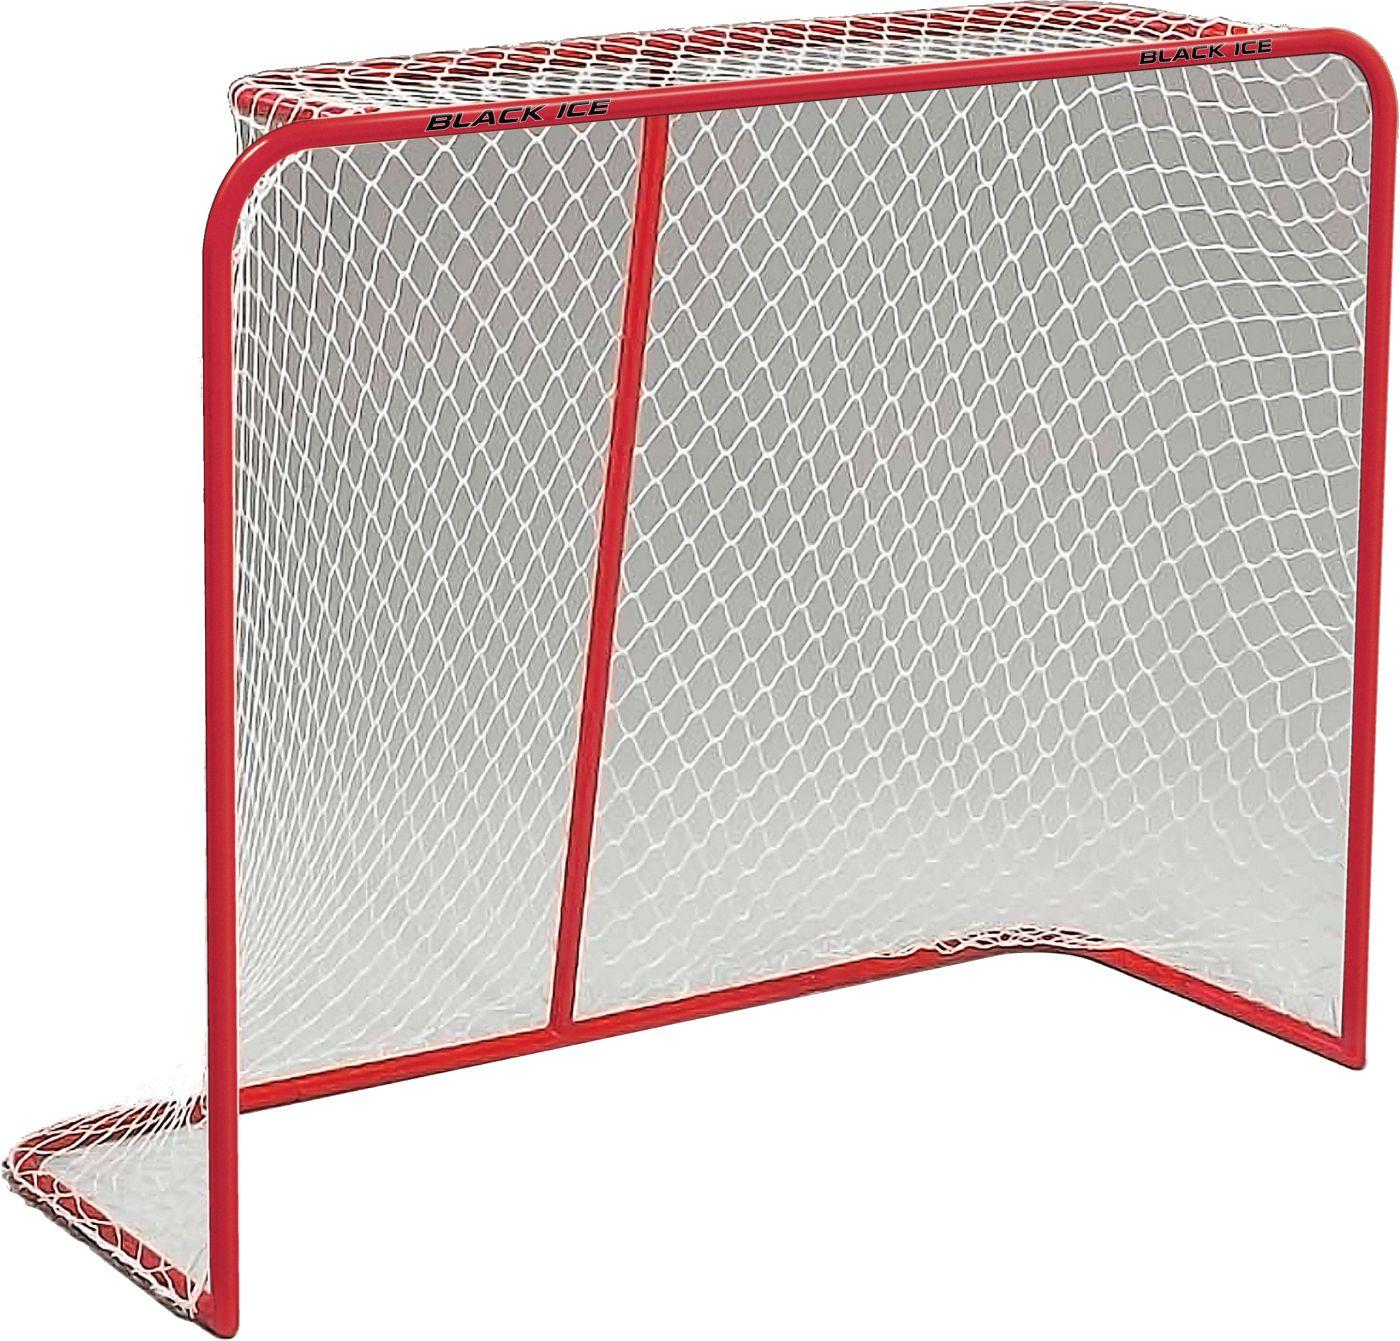 Black Ice 54'' Metal Street Hockey Goal